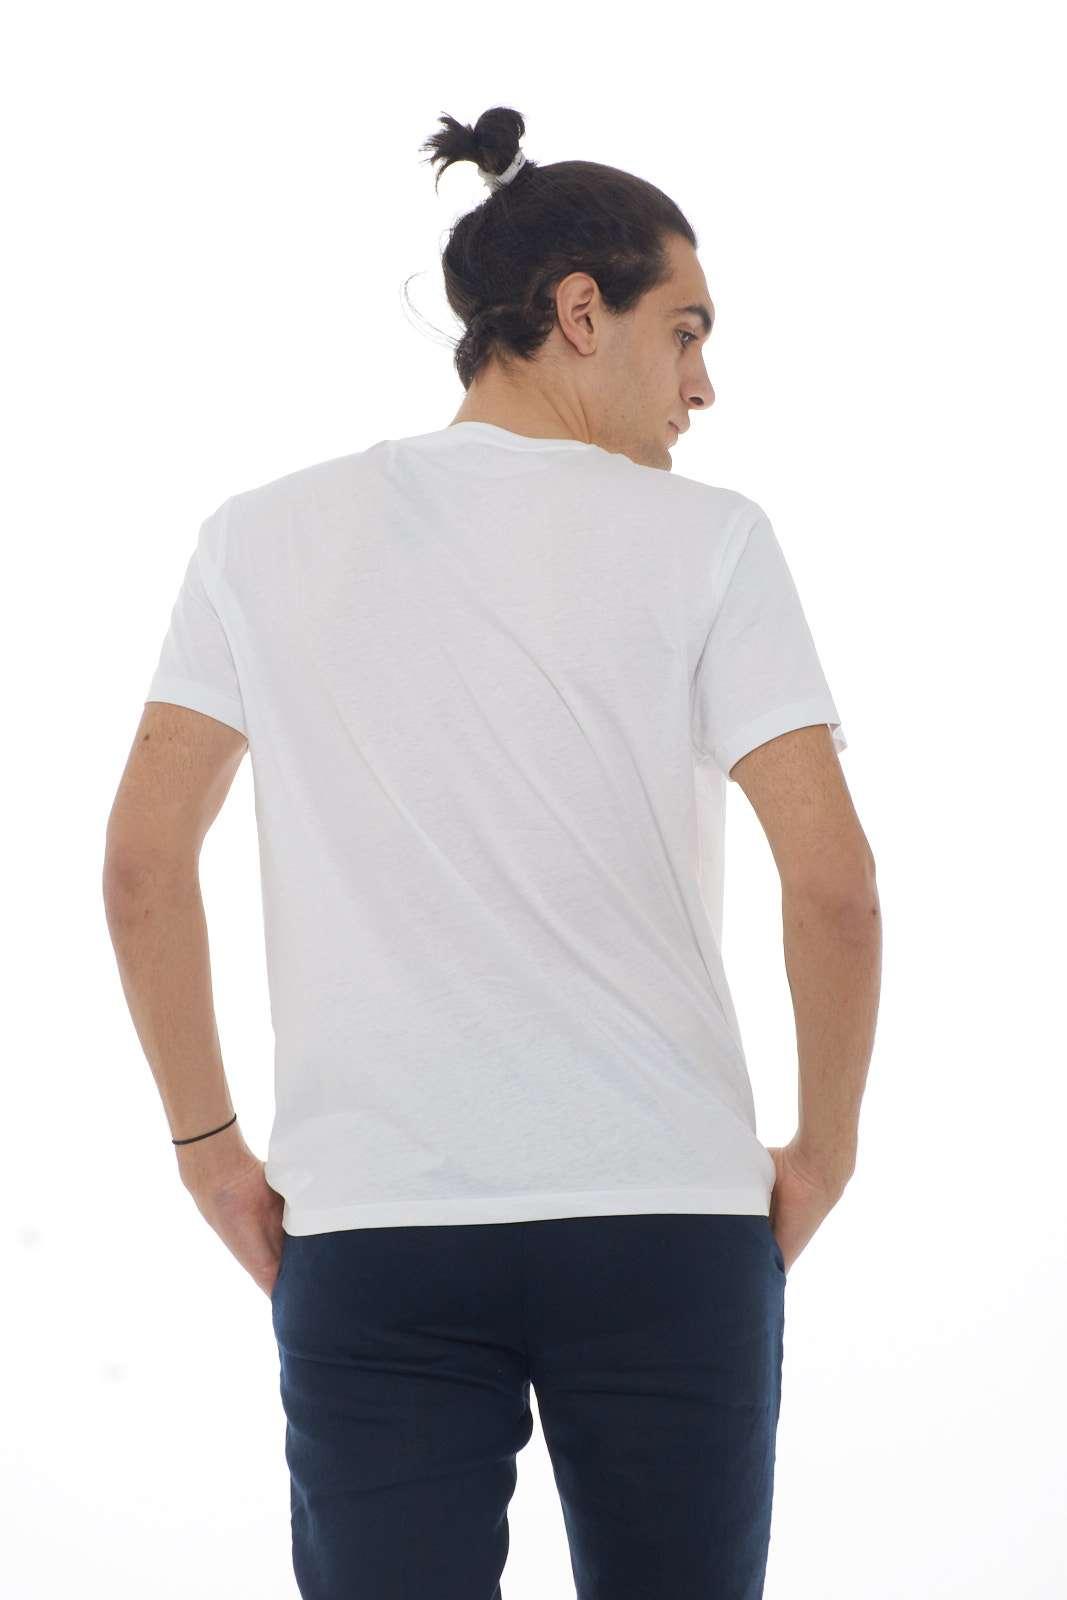 https://www.parmax.com/media/catalog/product/a/i/PE-outlet_parmax-t-shirt-uomo-Polo-ralph-Lauren-710740968-C.jpg